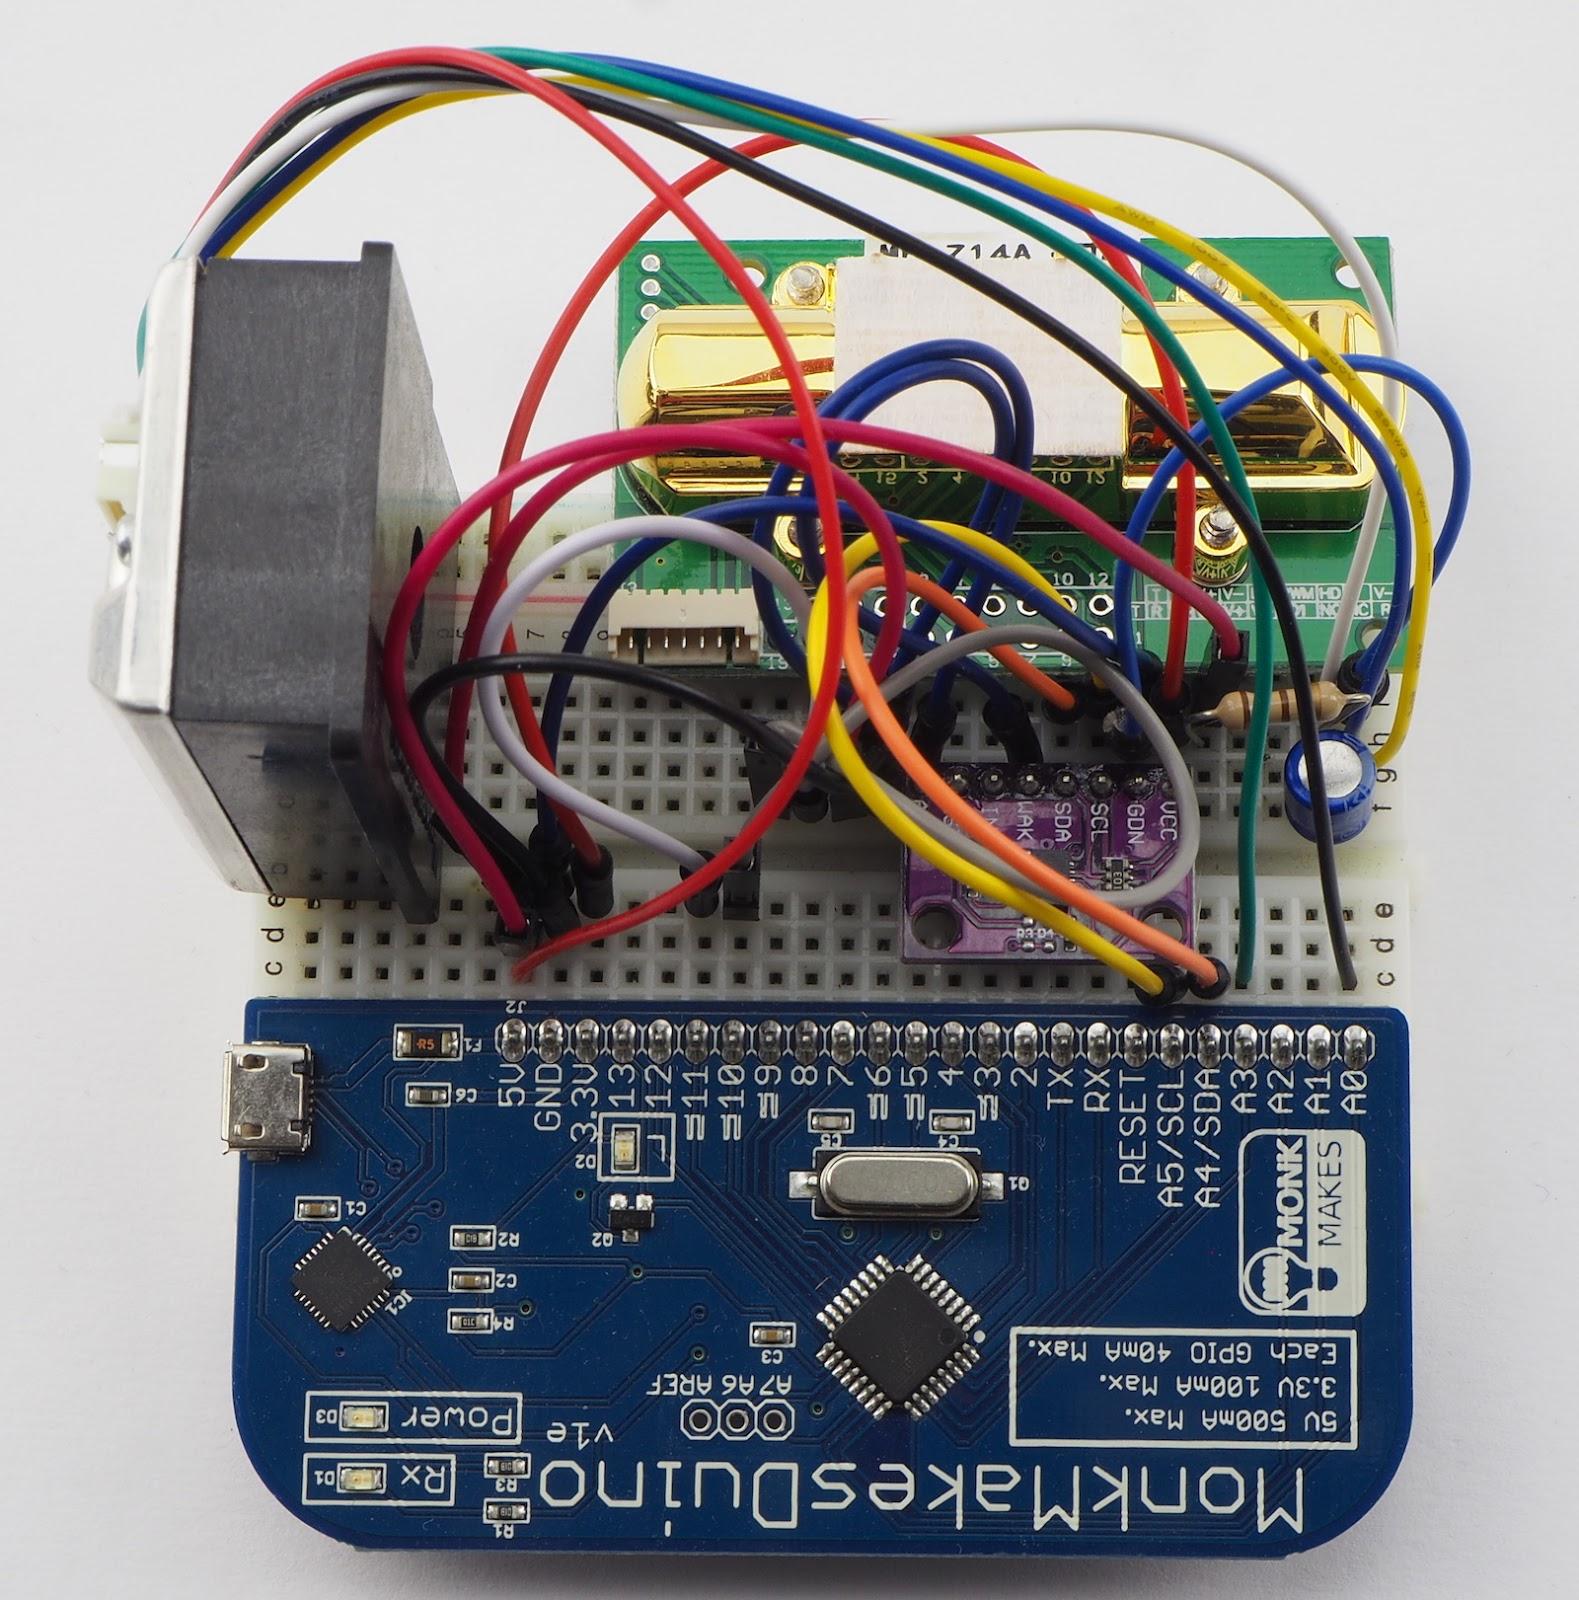 A3 electronics